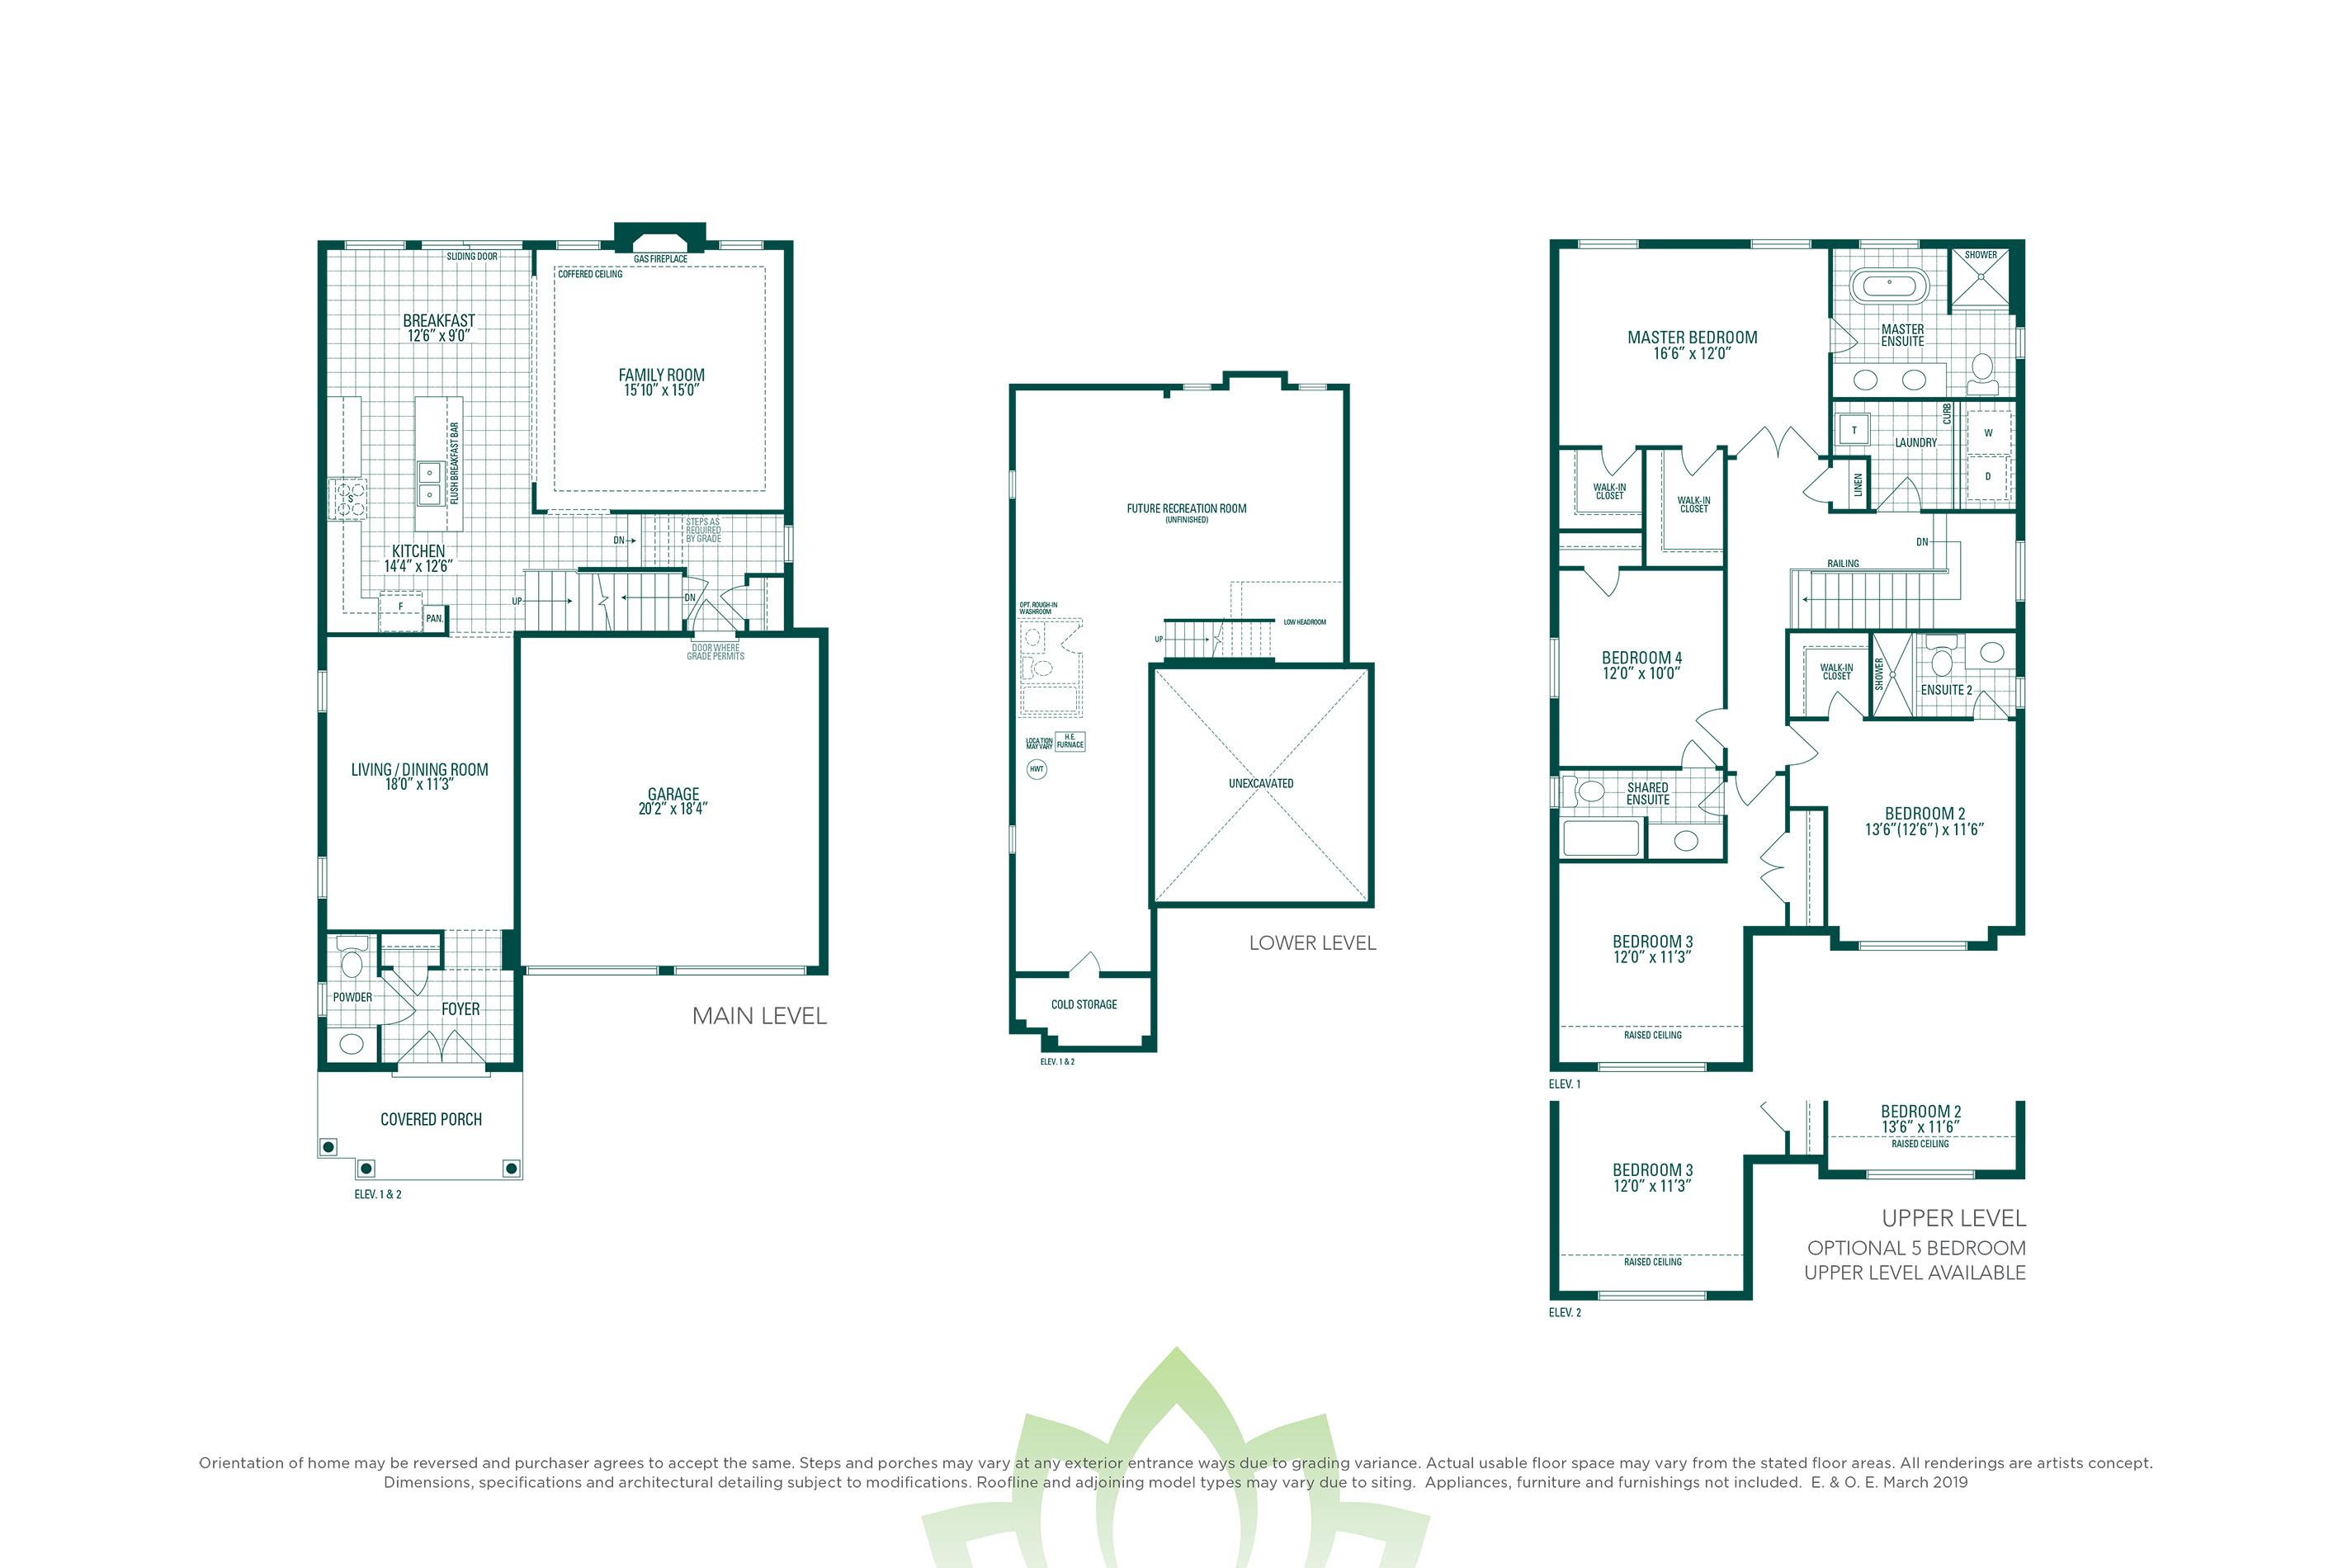 Preston 1 Floorplan